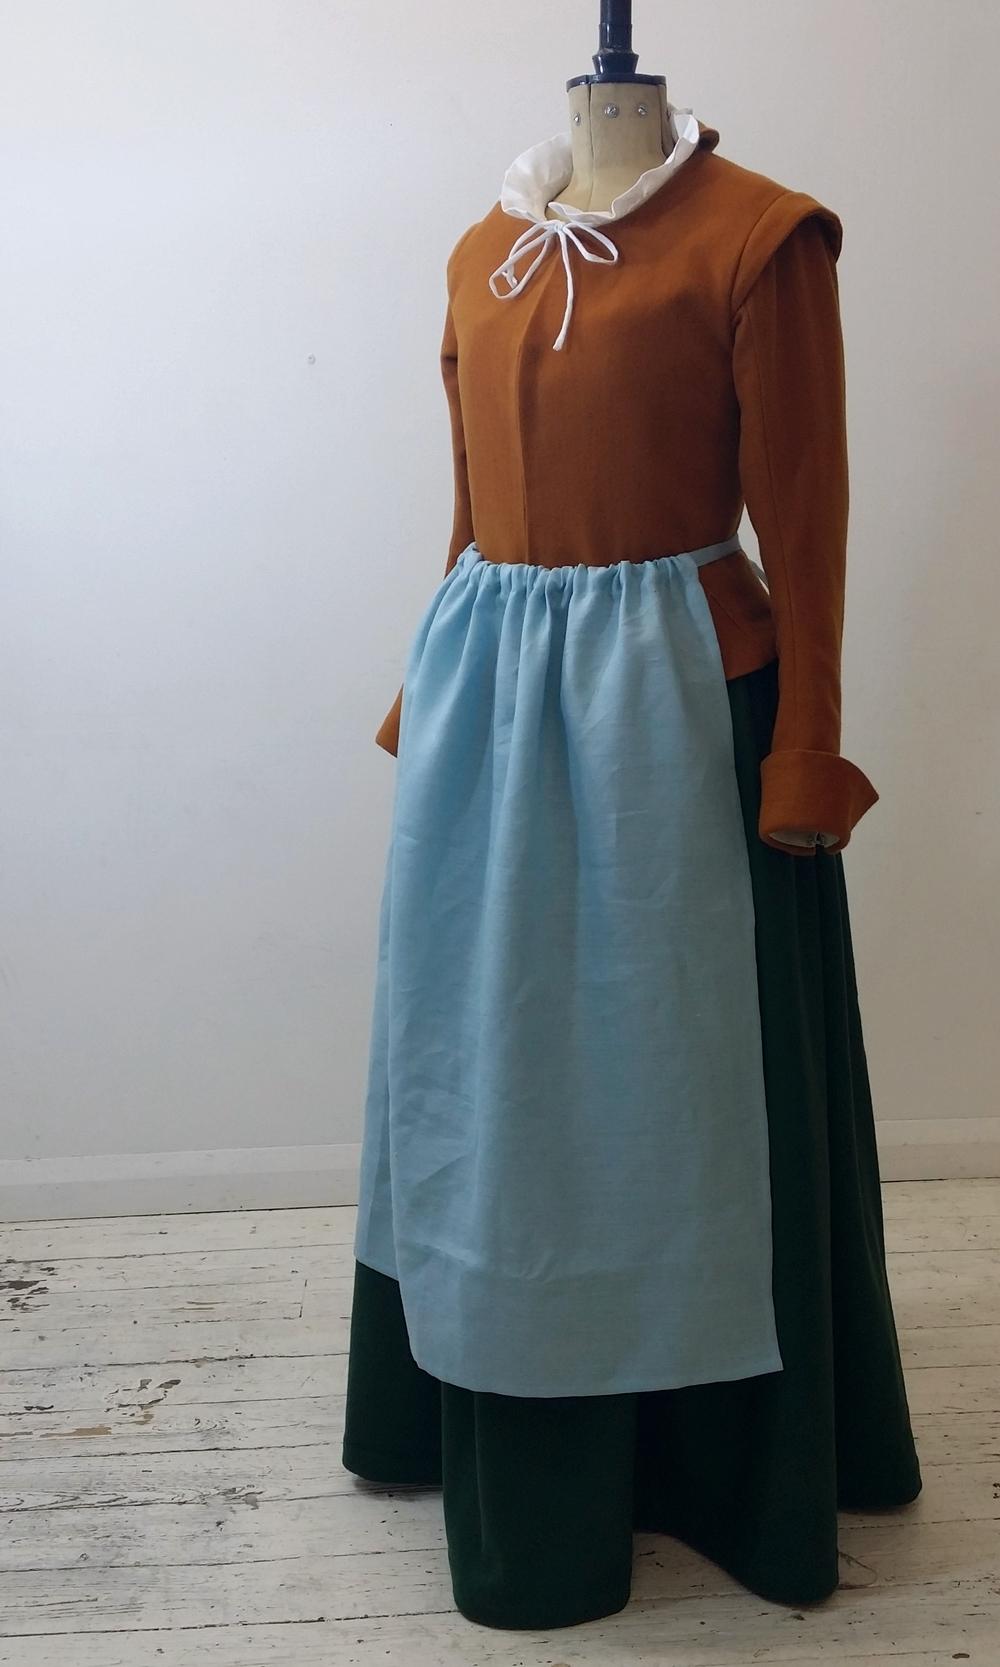 Woollen Waistcoat and Apron